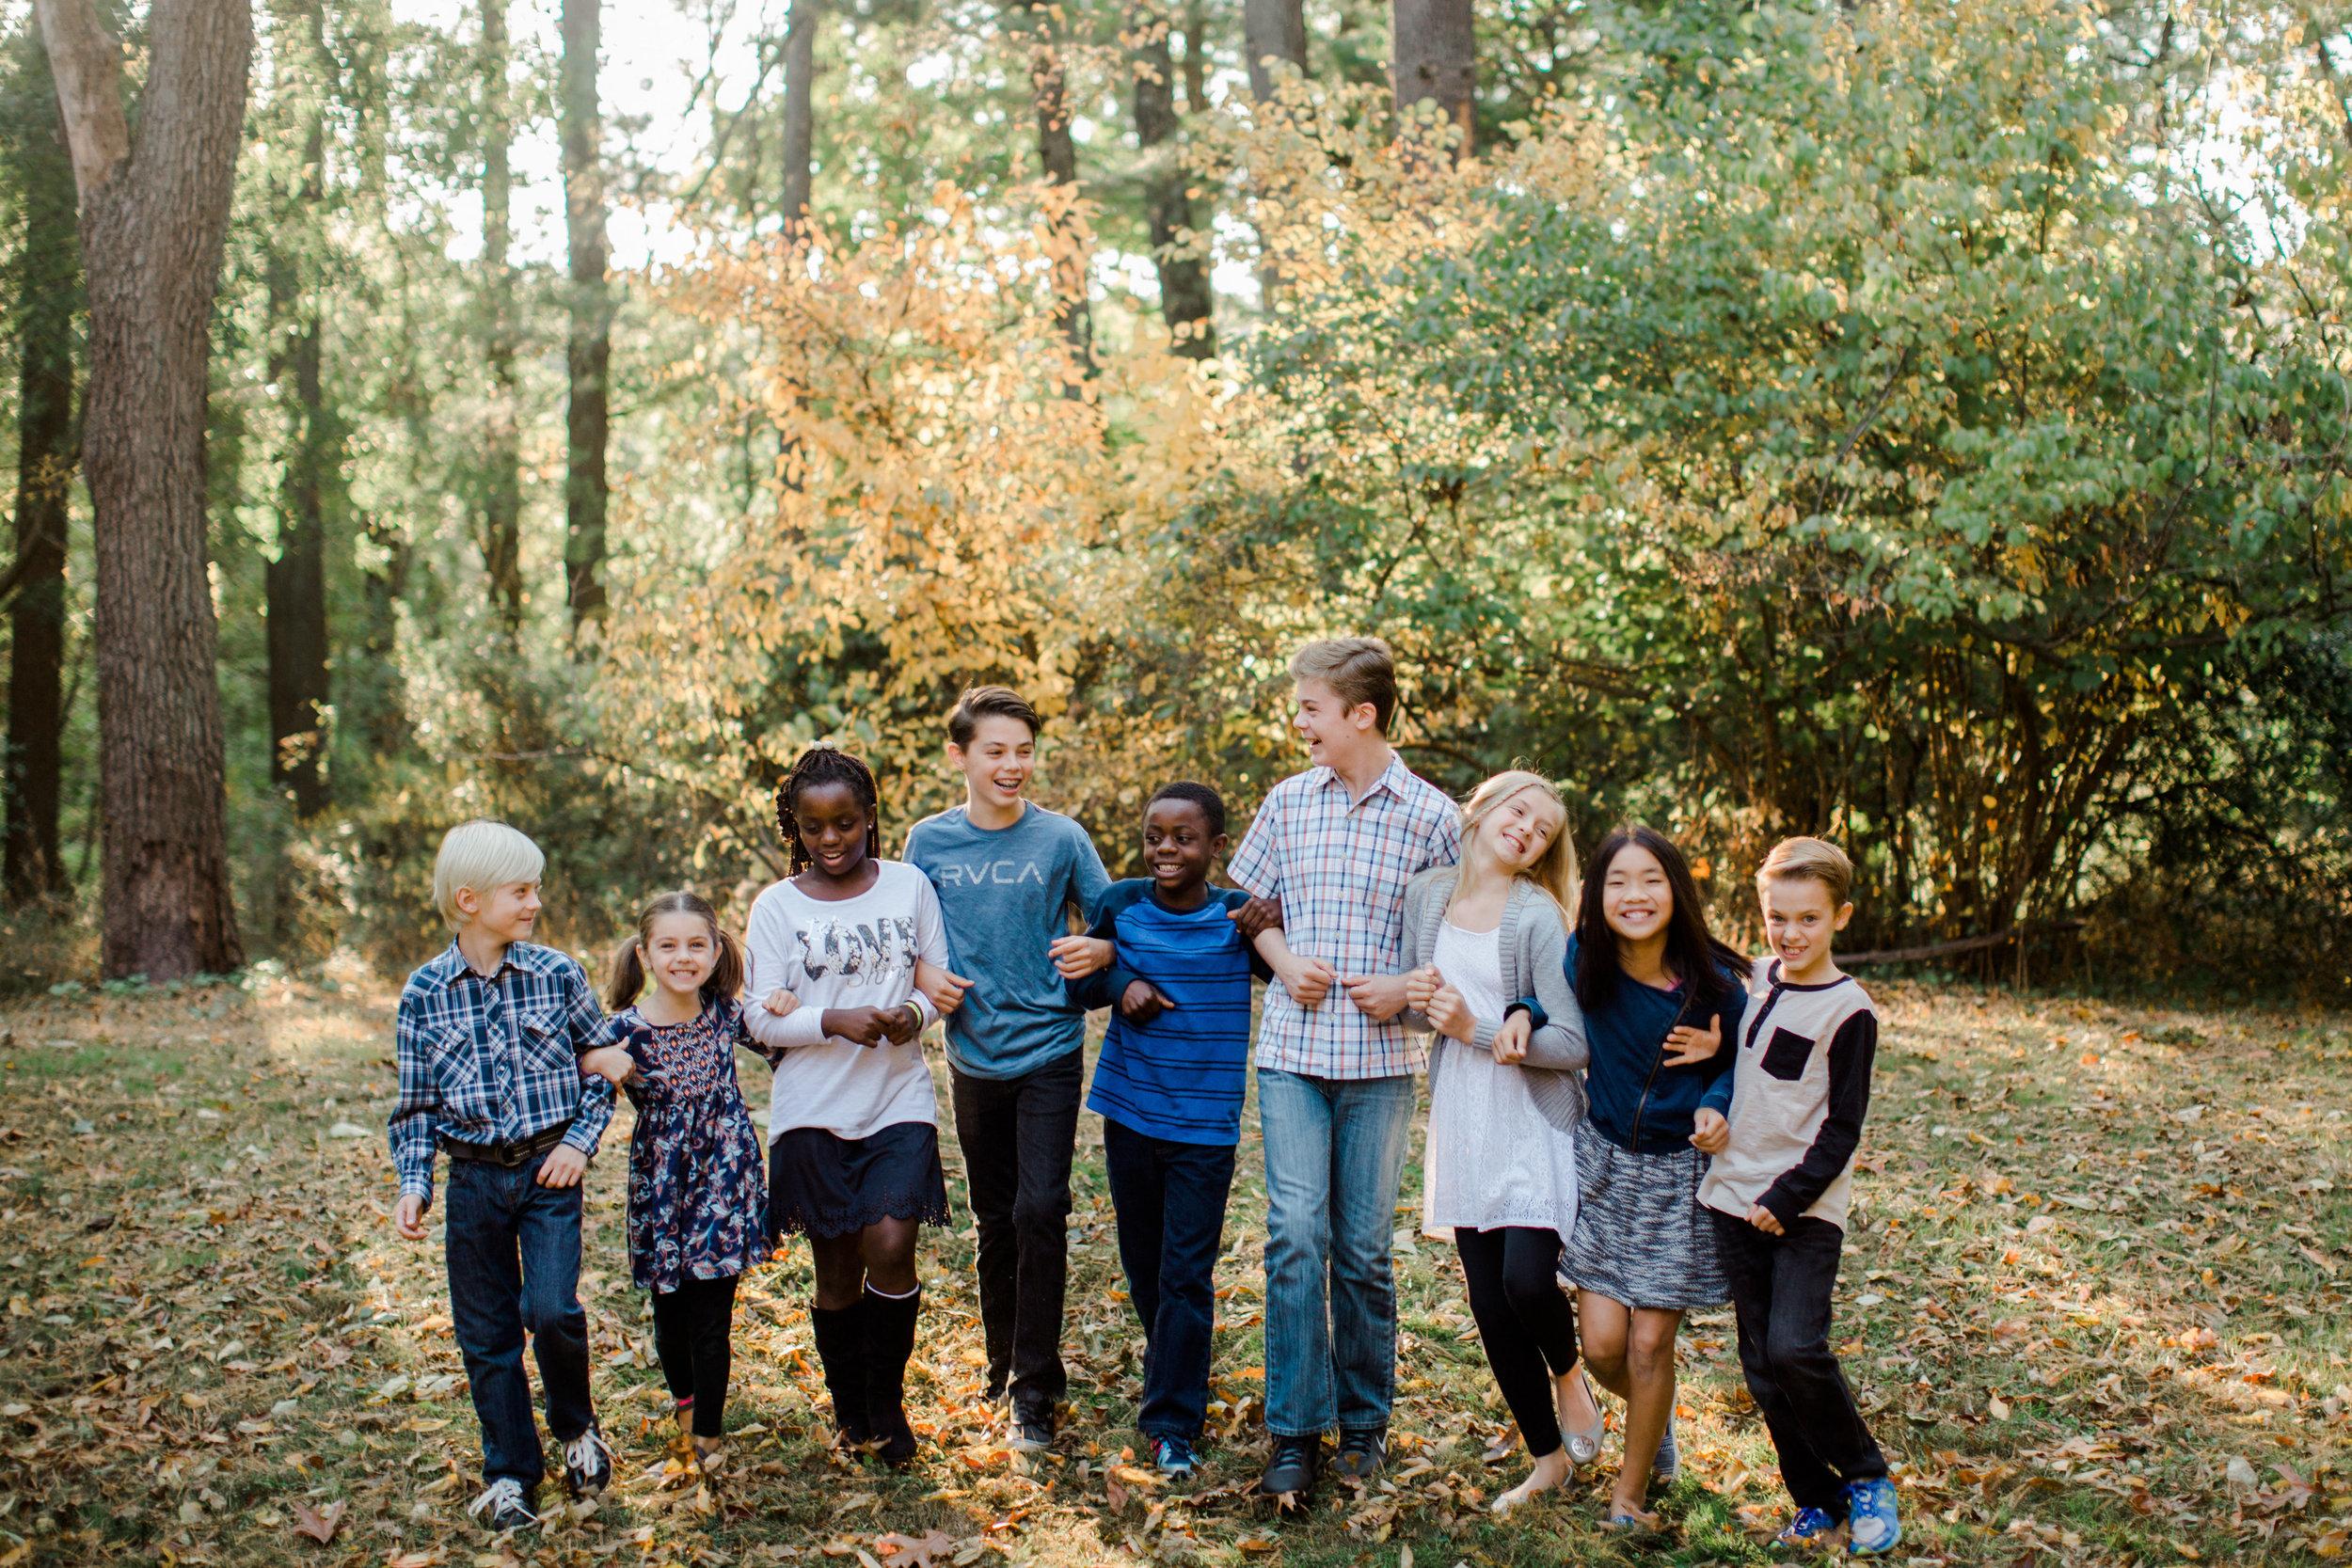 Sack s Kids-Sack s Kids-0001.jpg